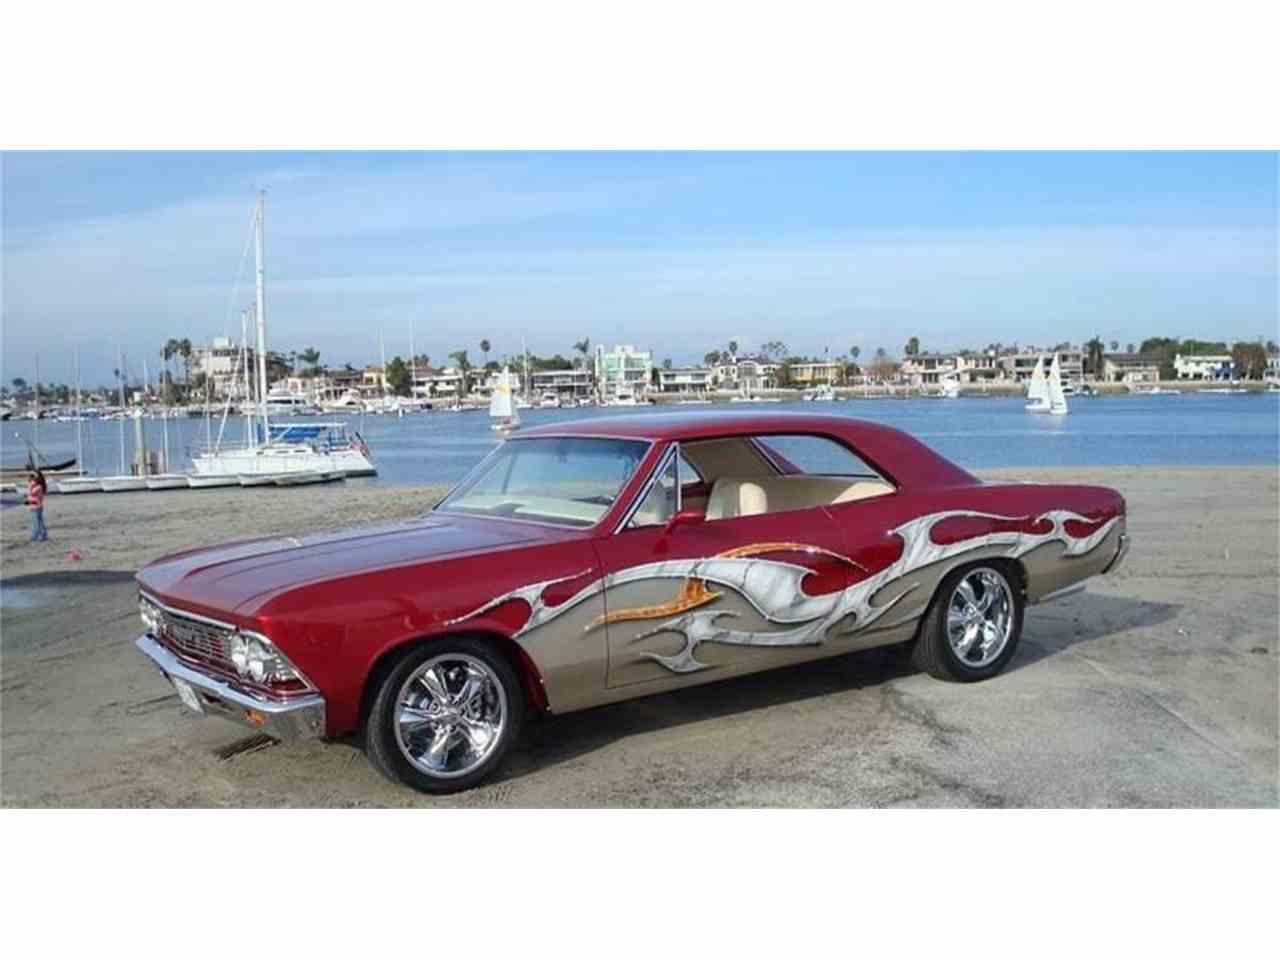 1966 Chevrolet Chevelle for Sale | ClassicCars.com | CC-1009196